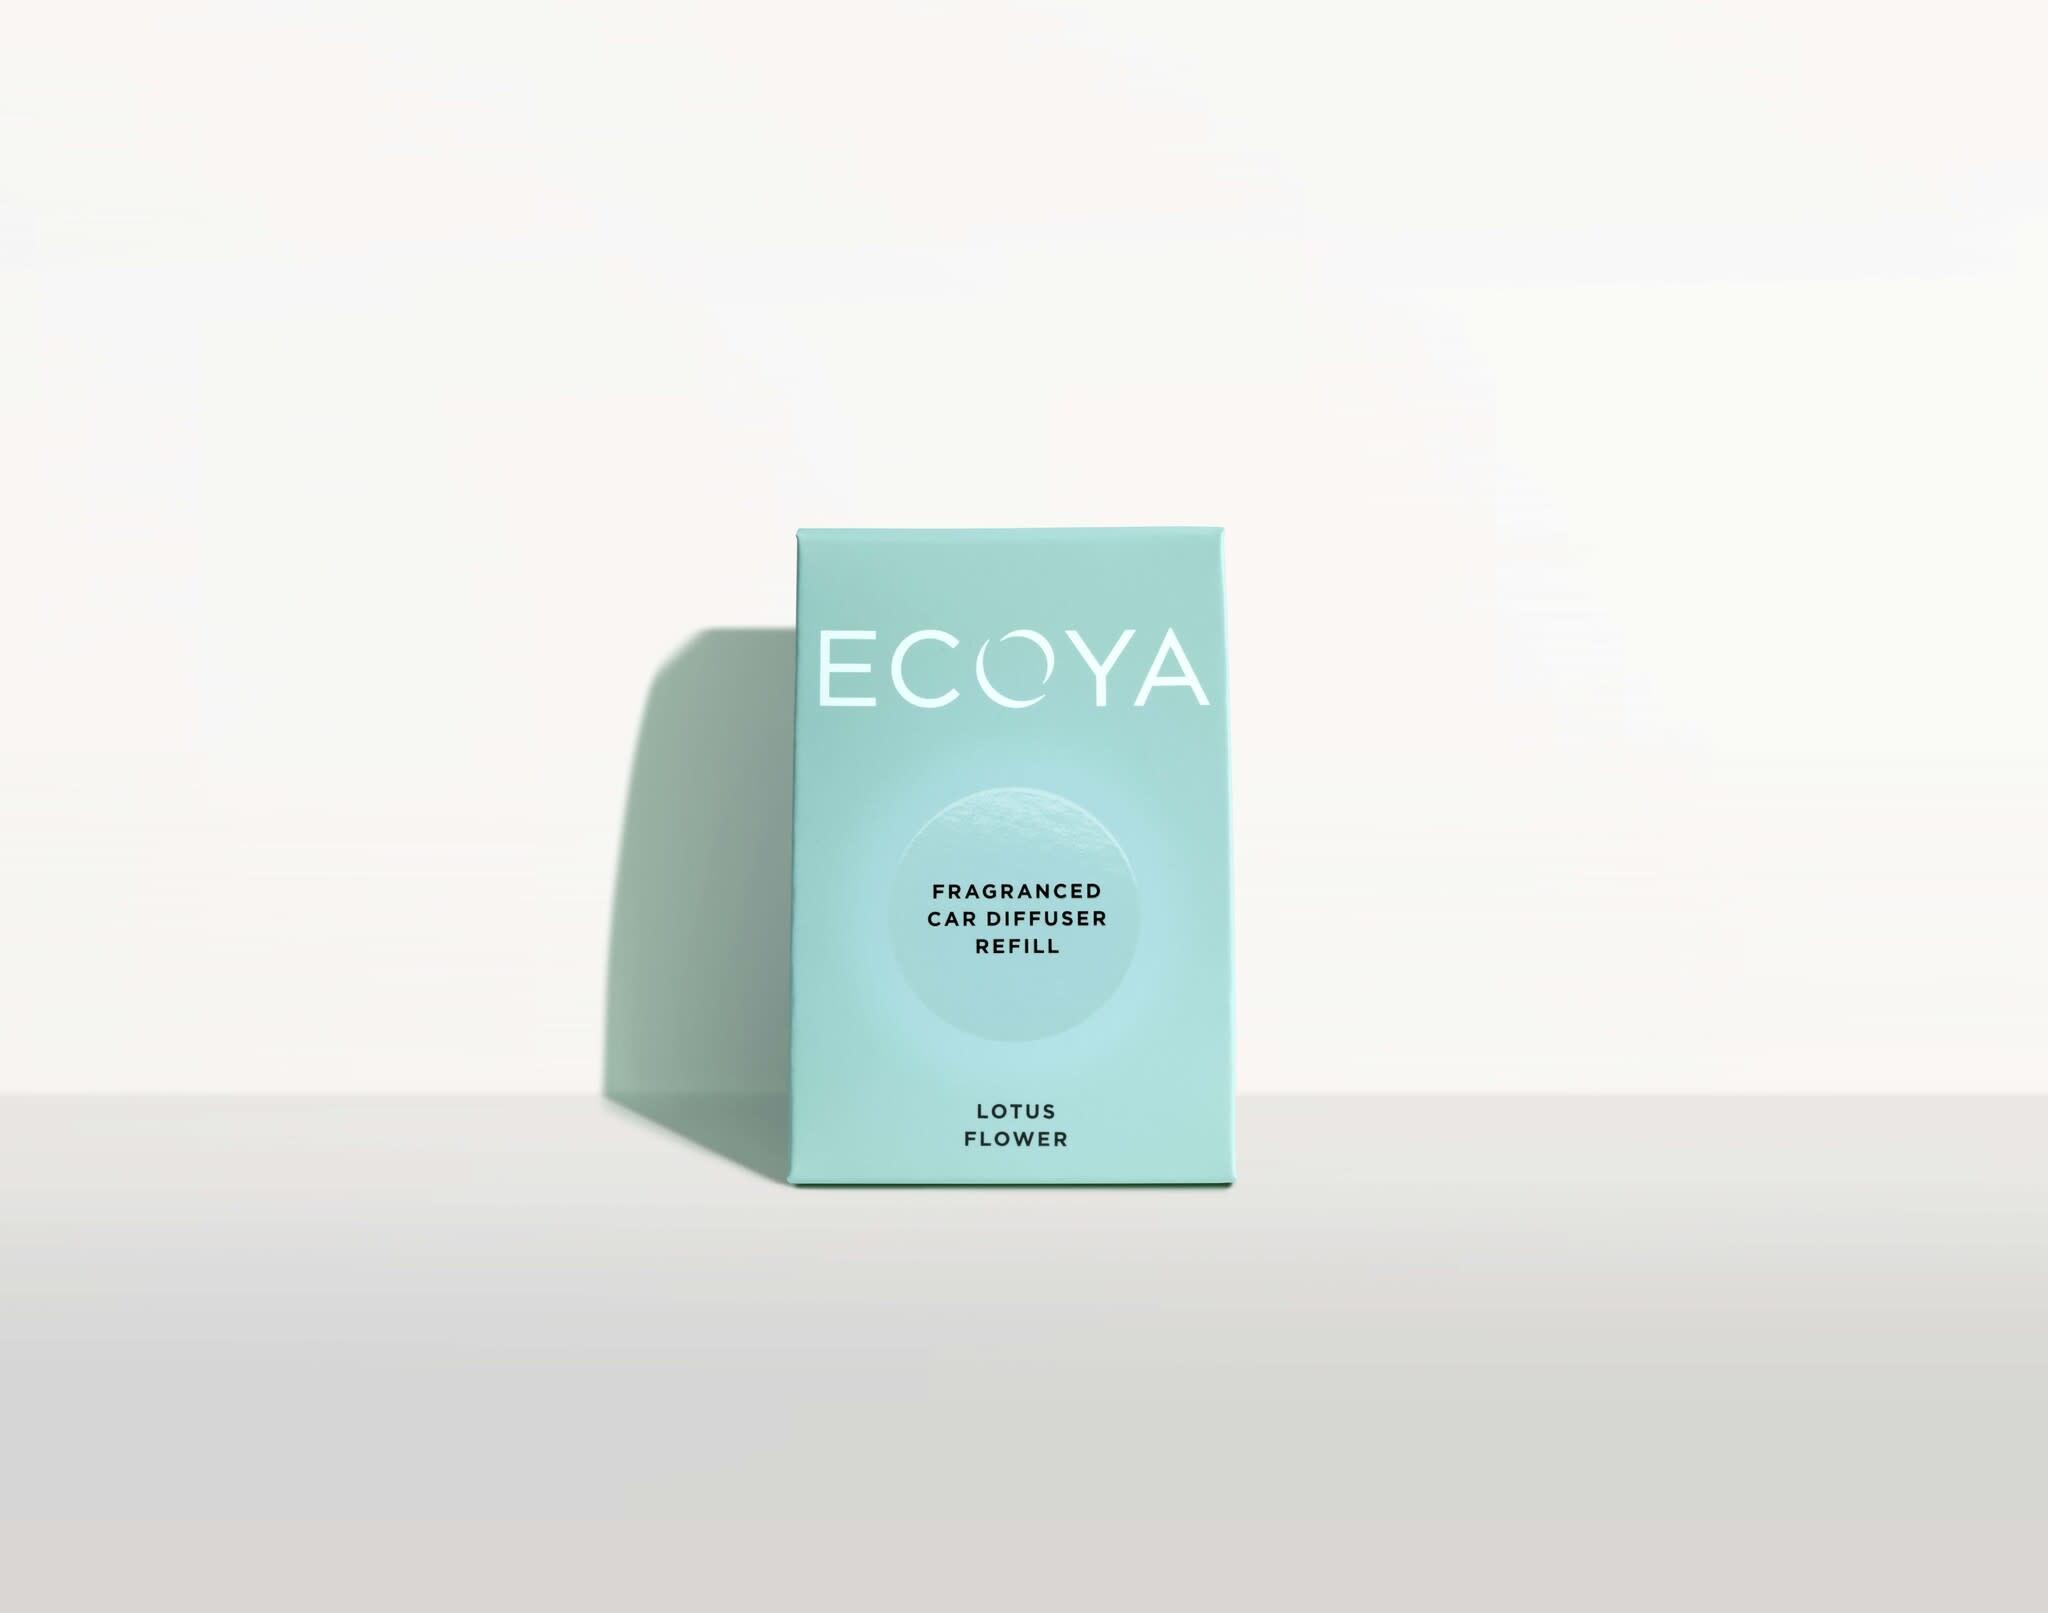 Ecoya Car Diffuser Refill